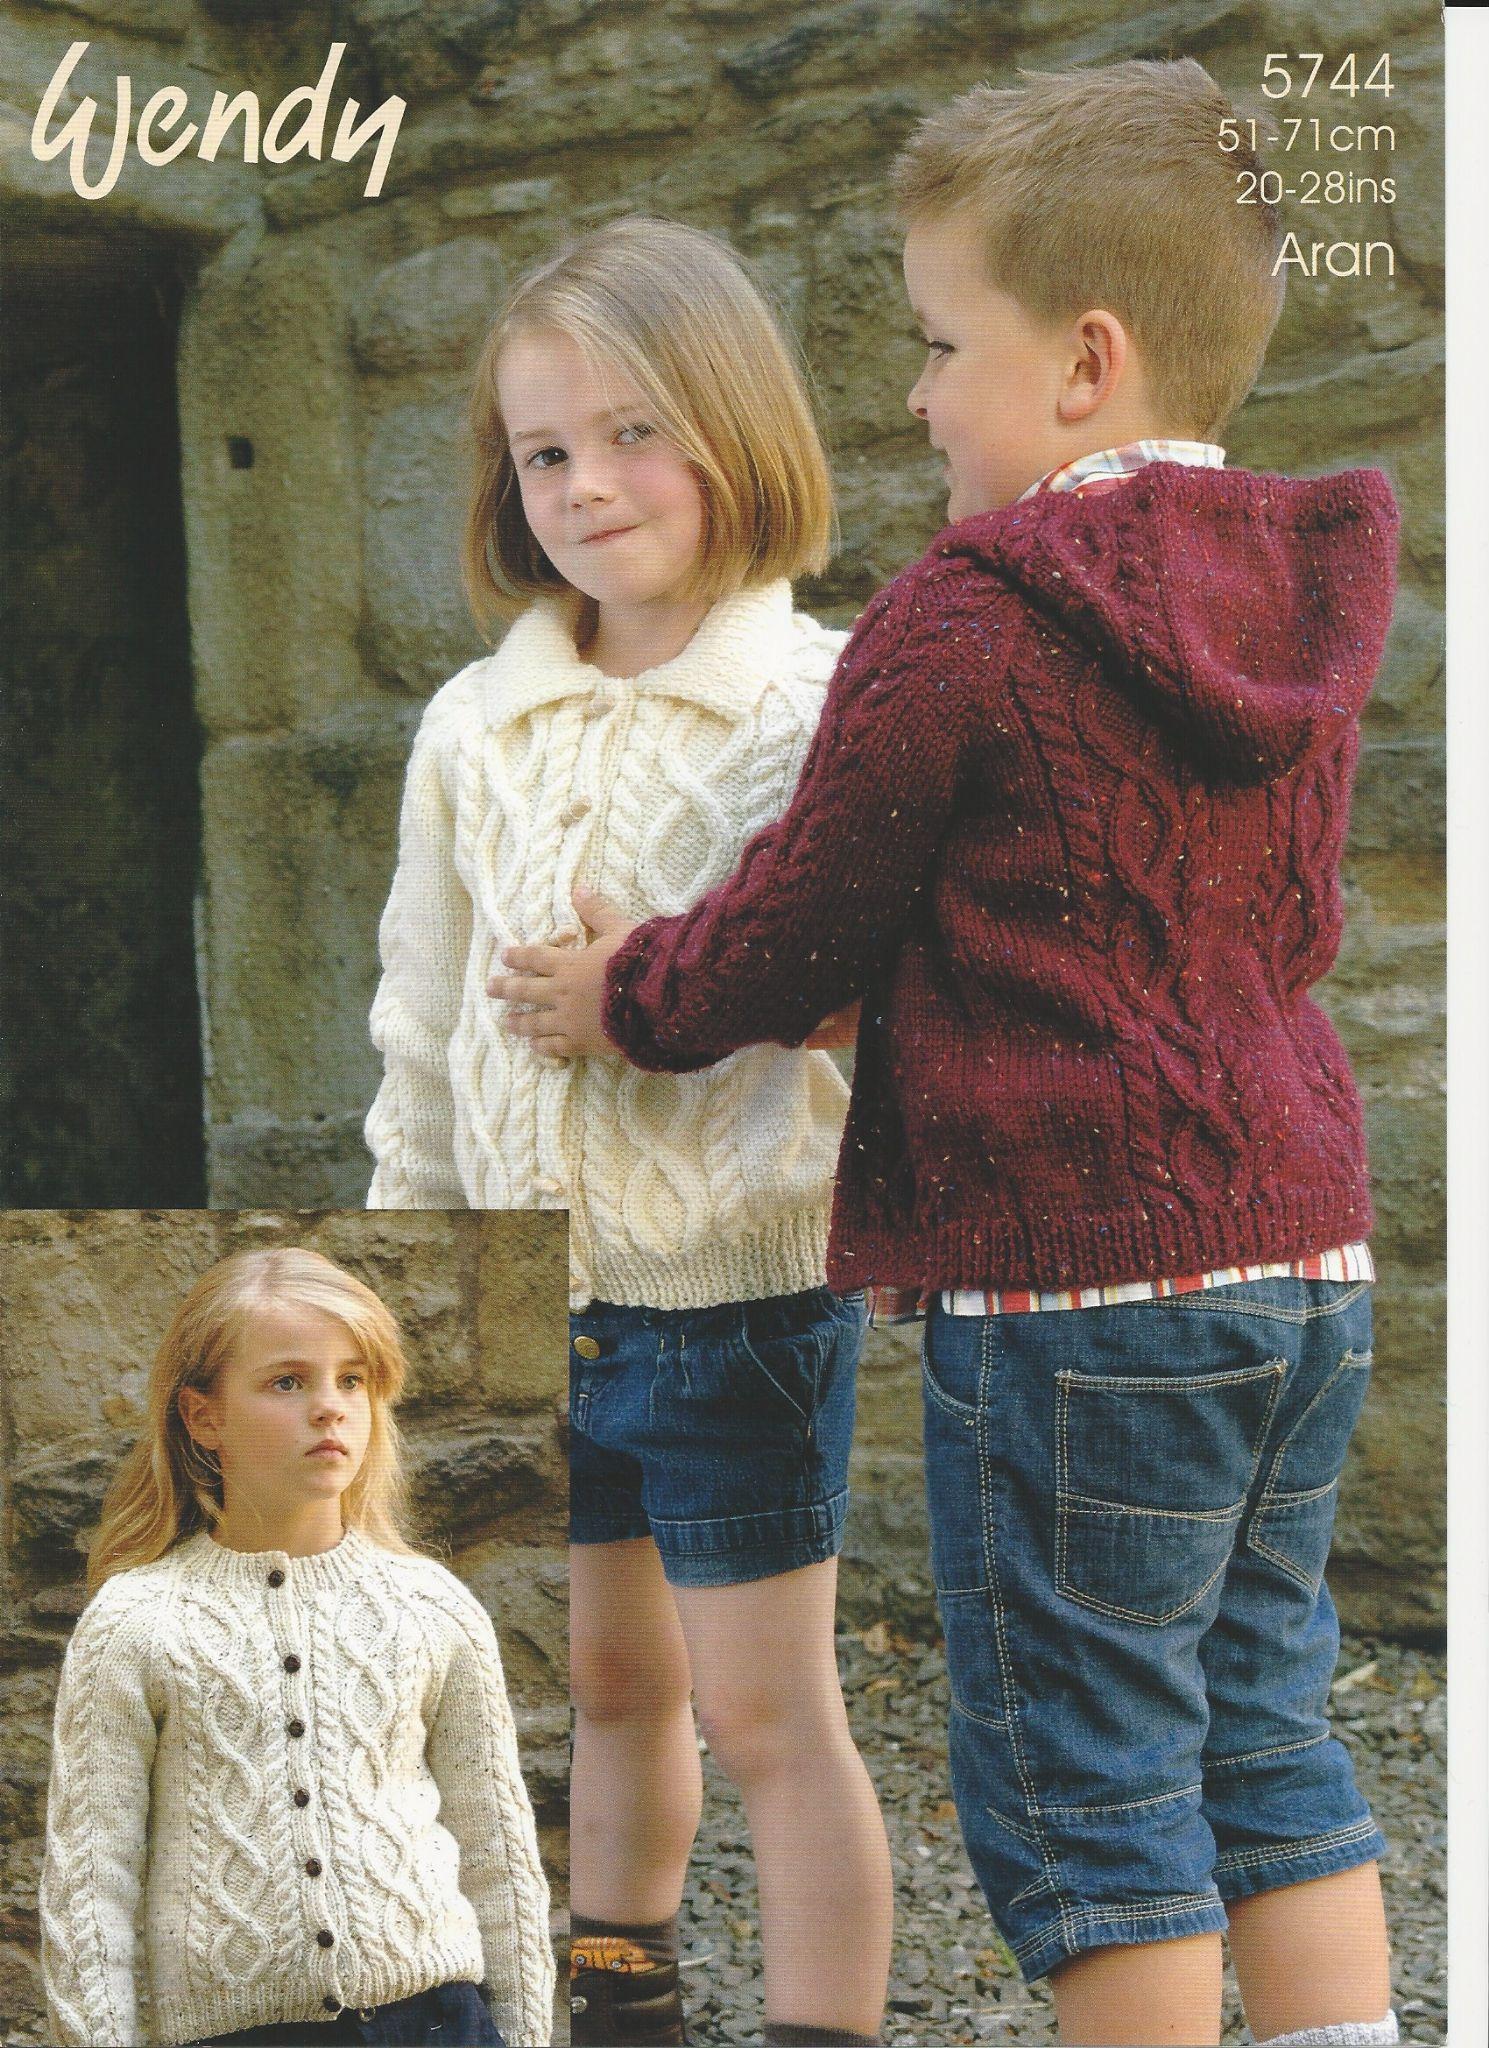 Childrens Aran Knitting Patterns Wendy Childrens Jacket Aran Knitting Pattern 5744